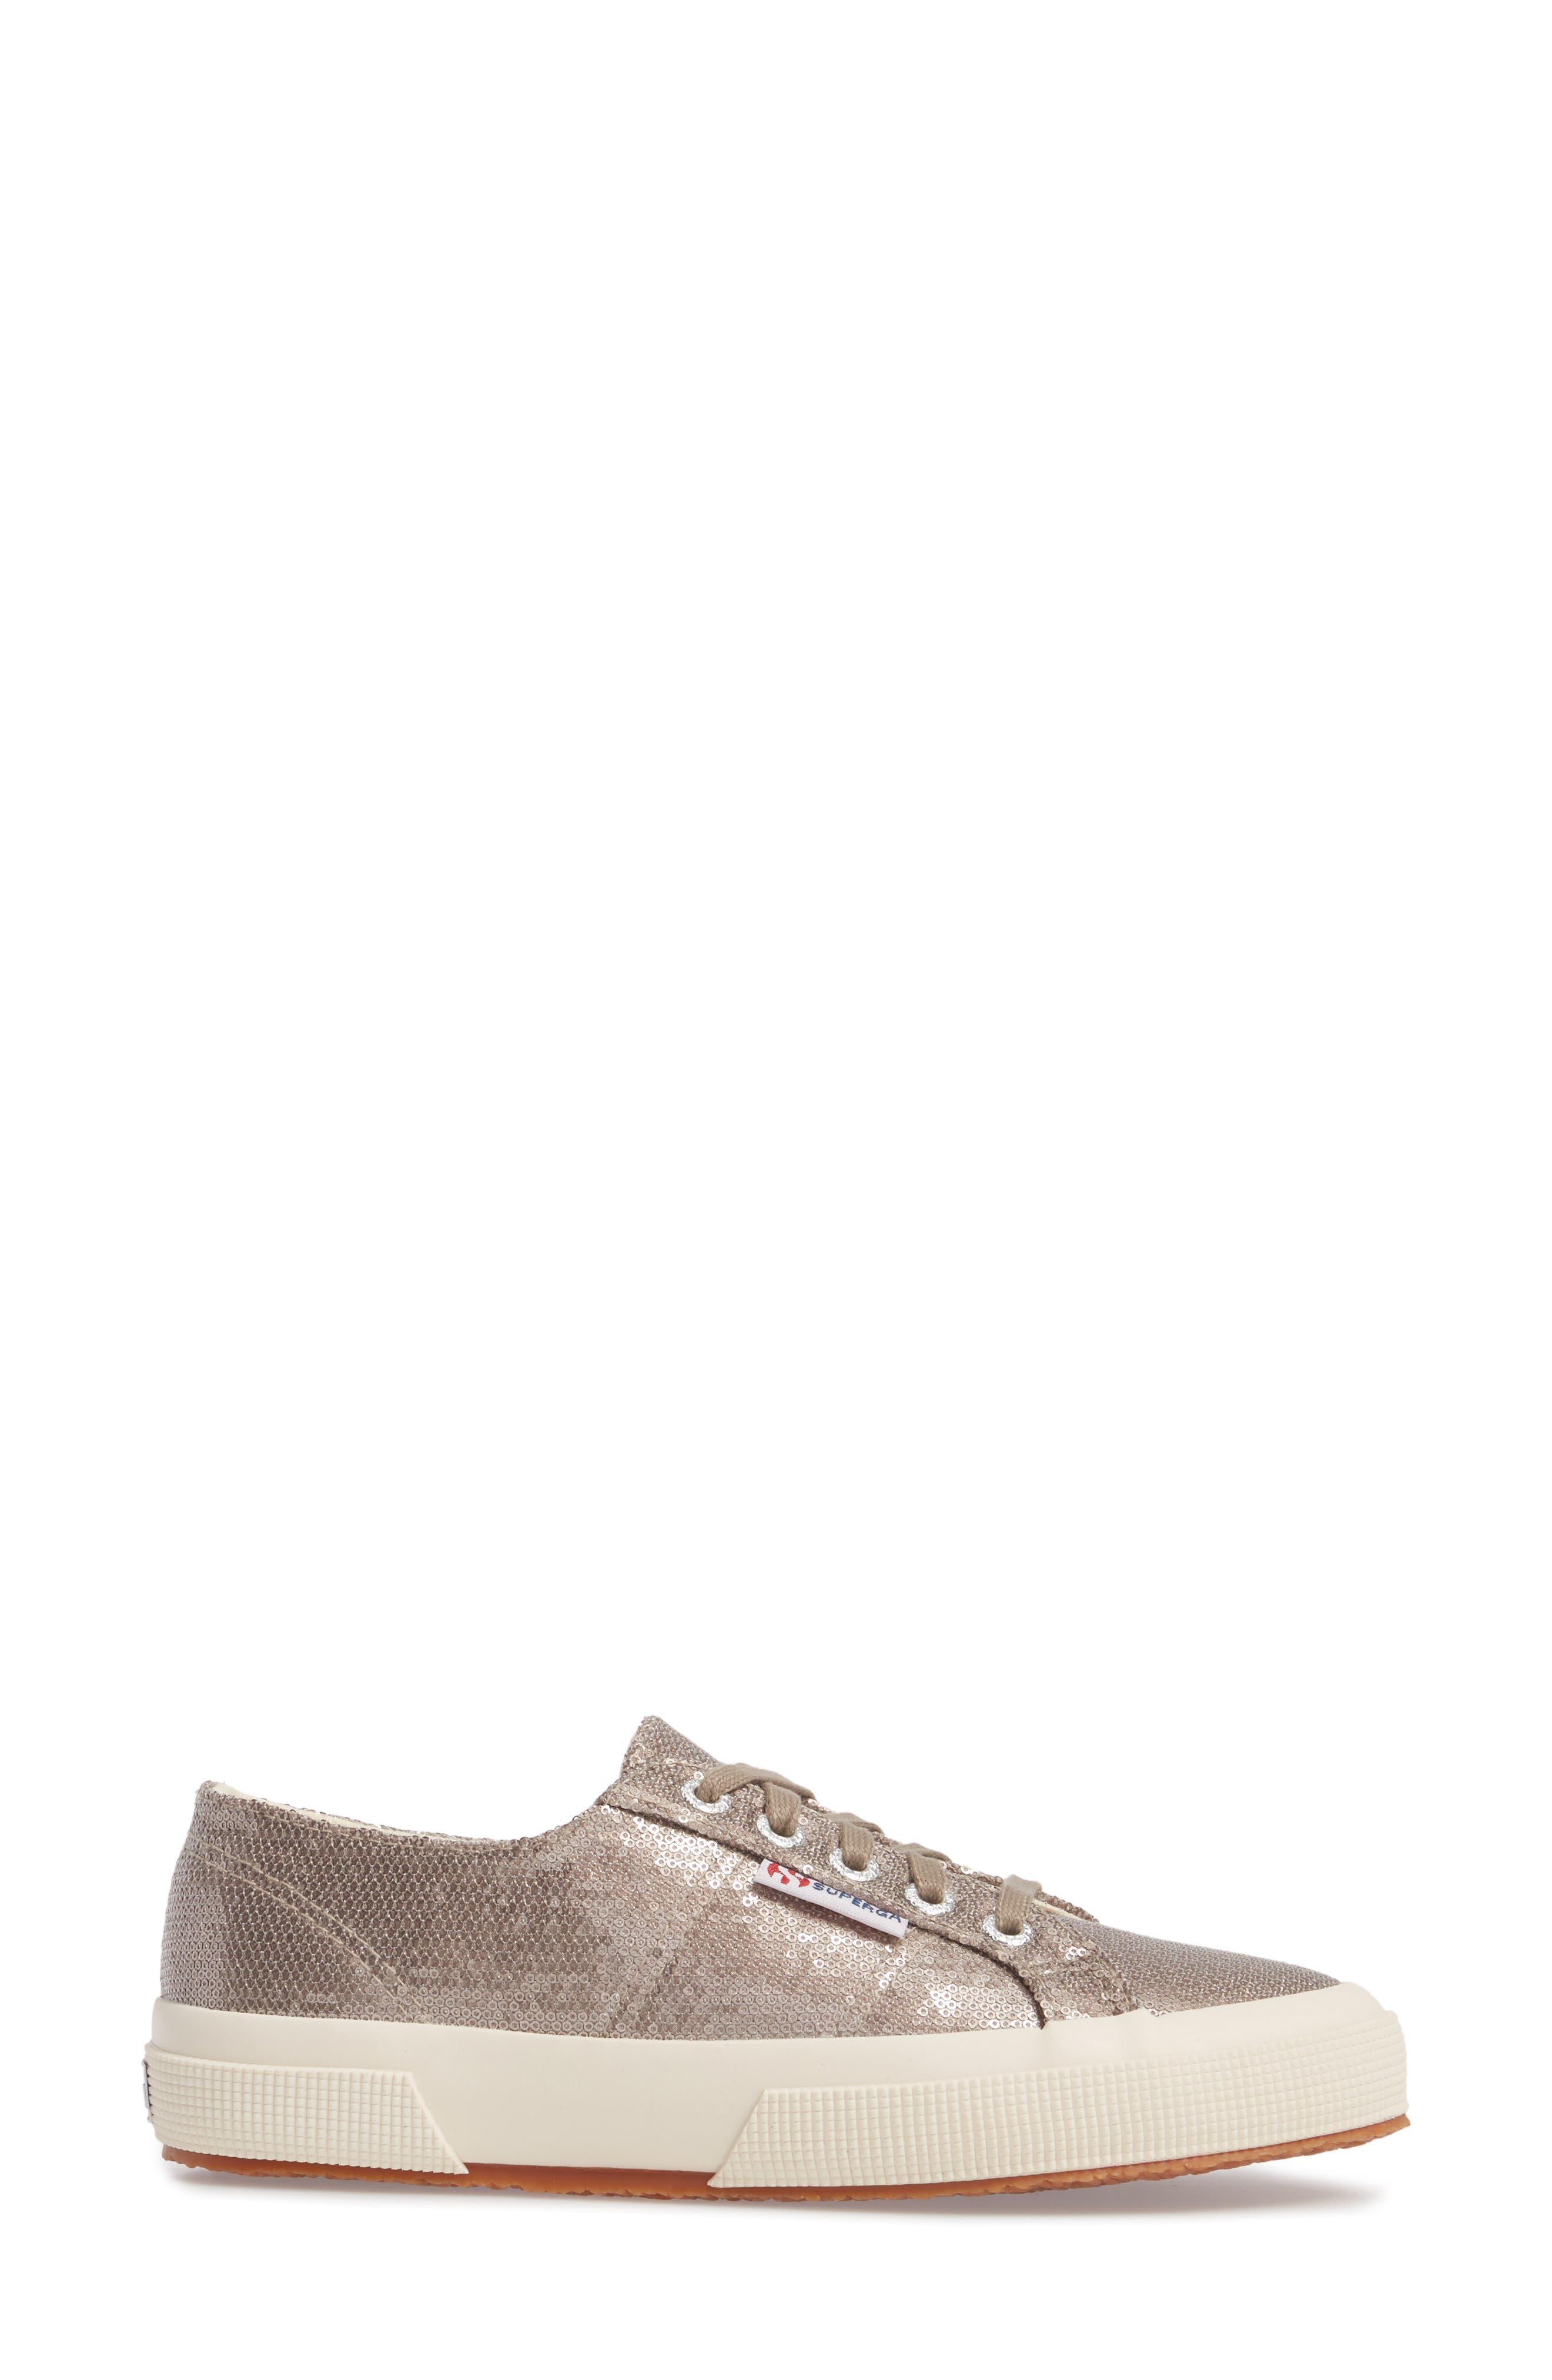 2750 Micro Sequin Sneaker,                             Alternate thumbnail 3, color,                             Bronze